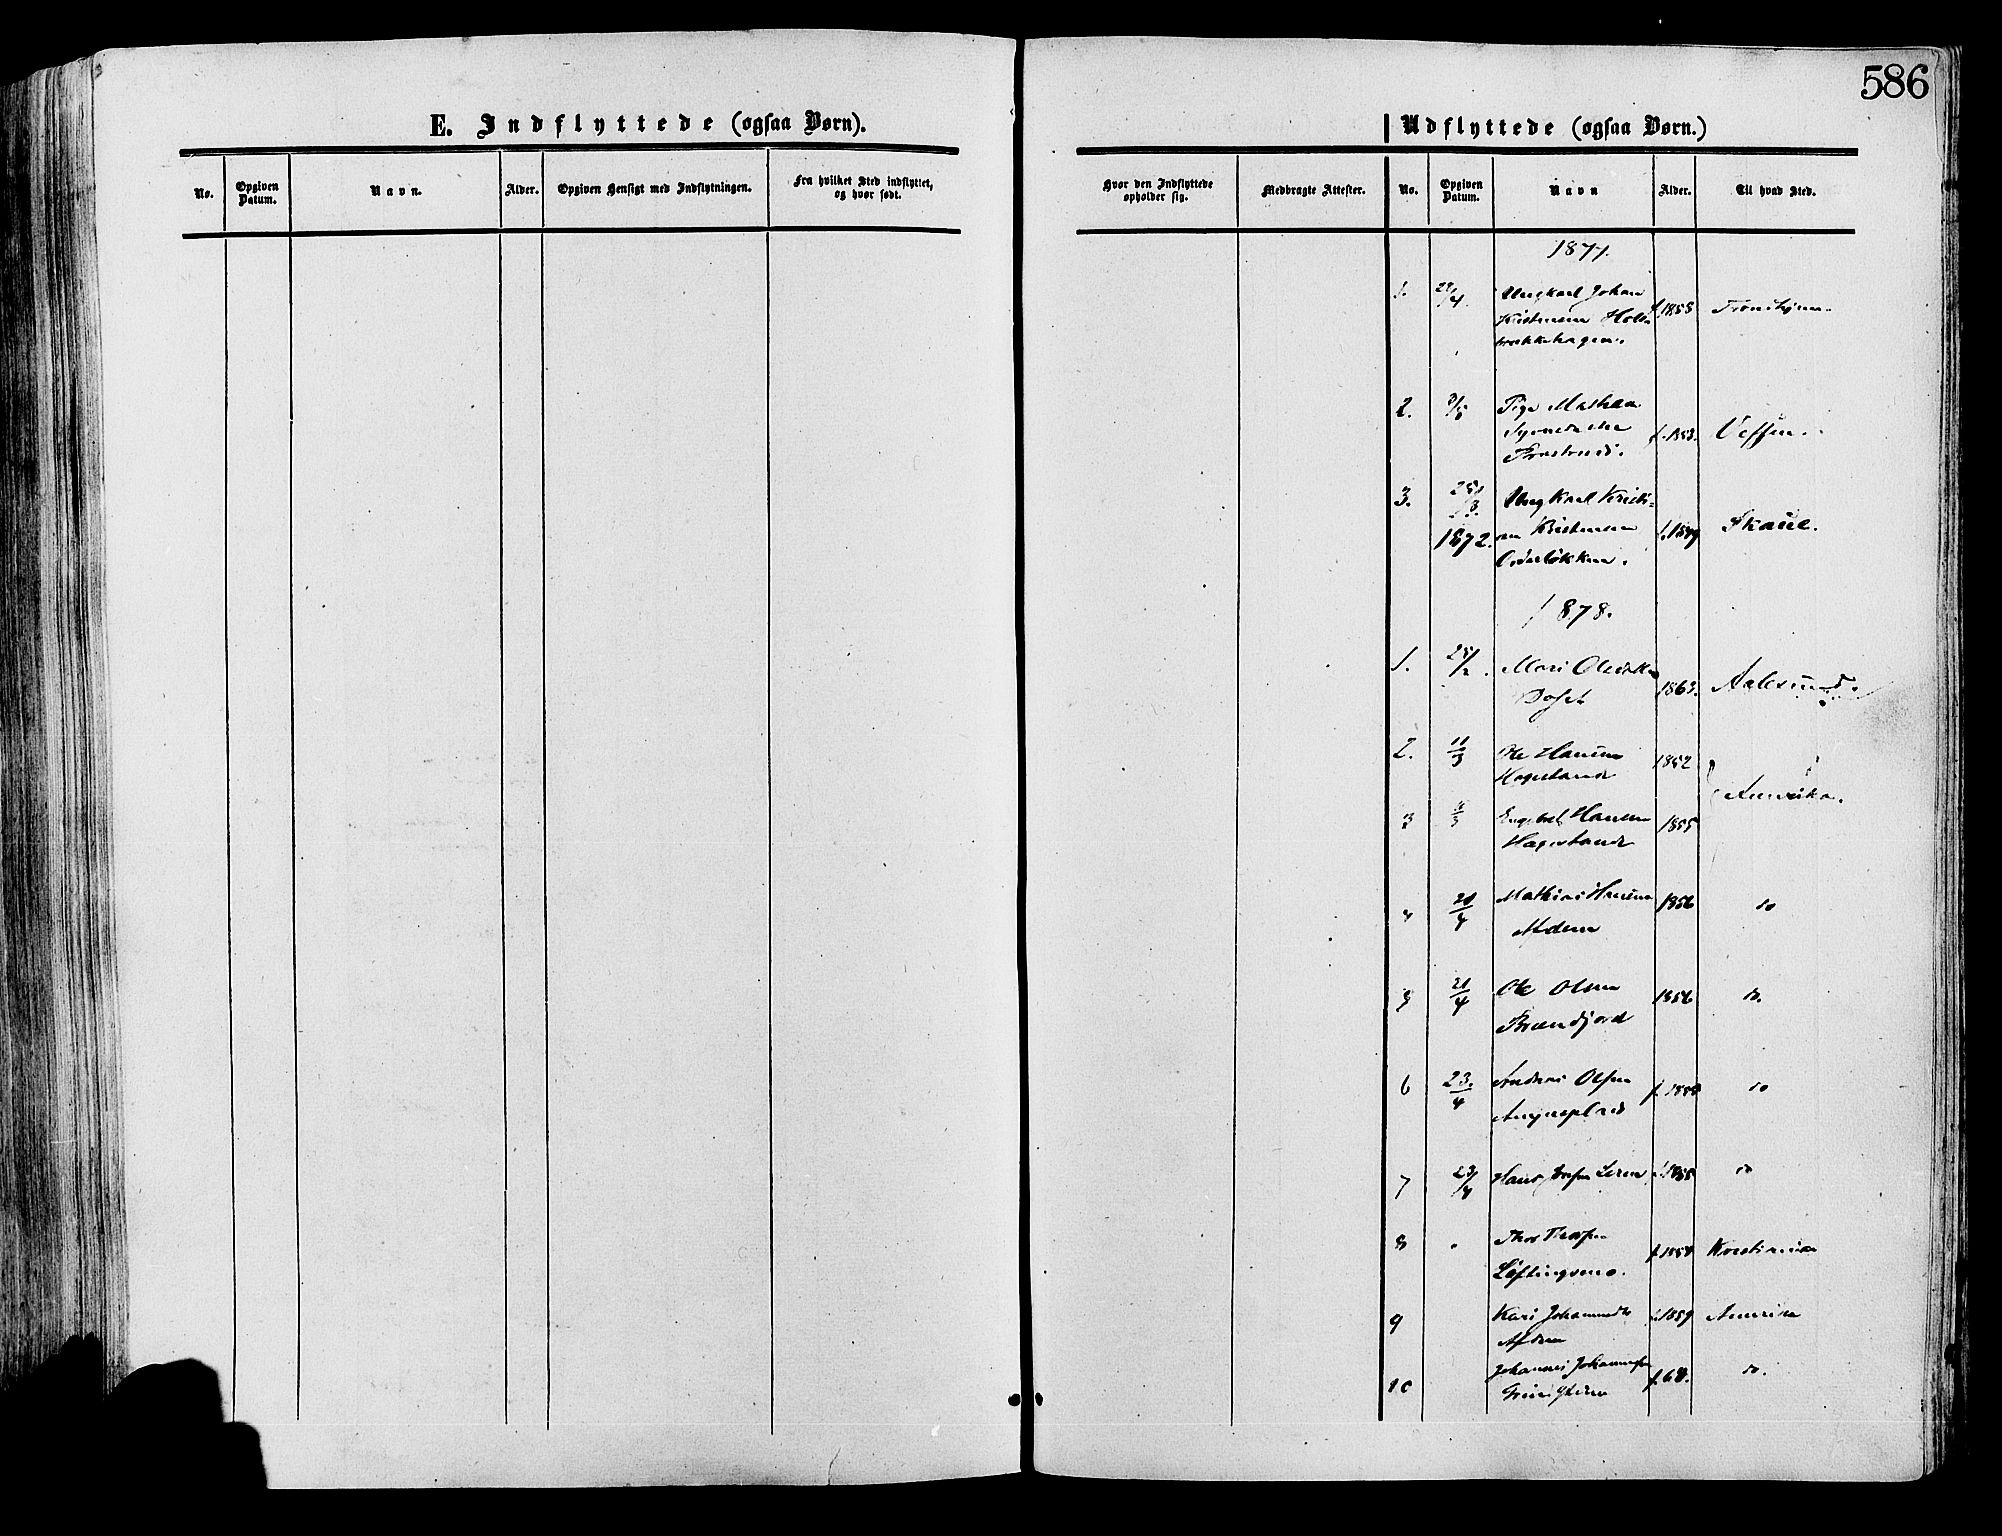 SAH, Lesja prestekontor, Ministerialbok nr. 8, 1854-1880, s. 586